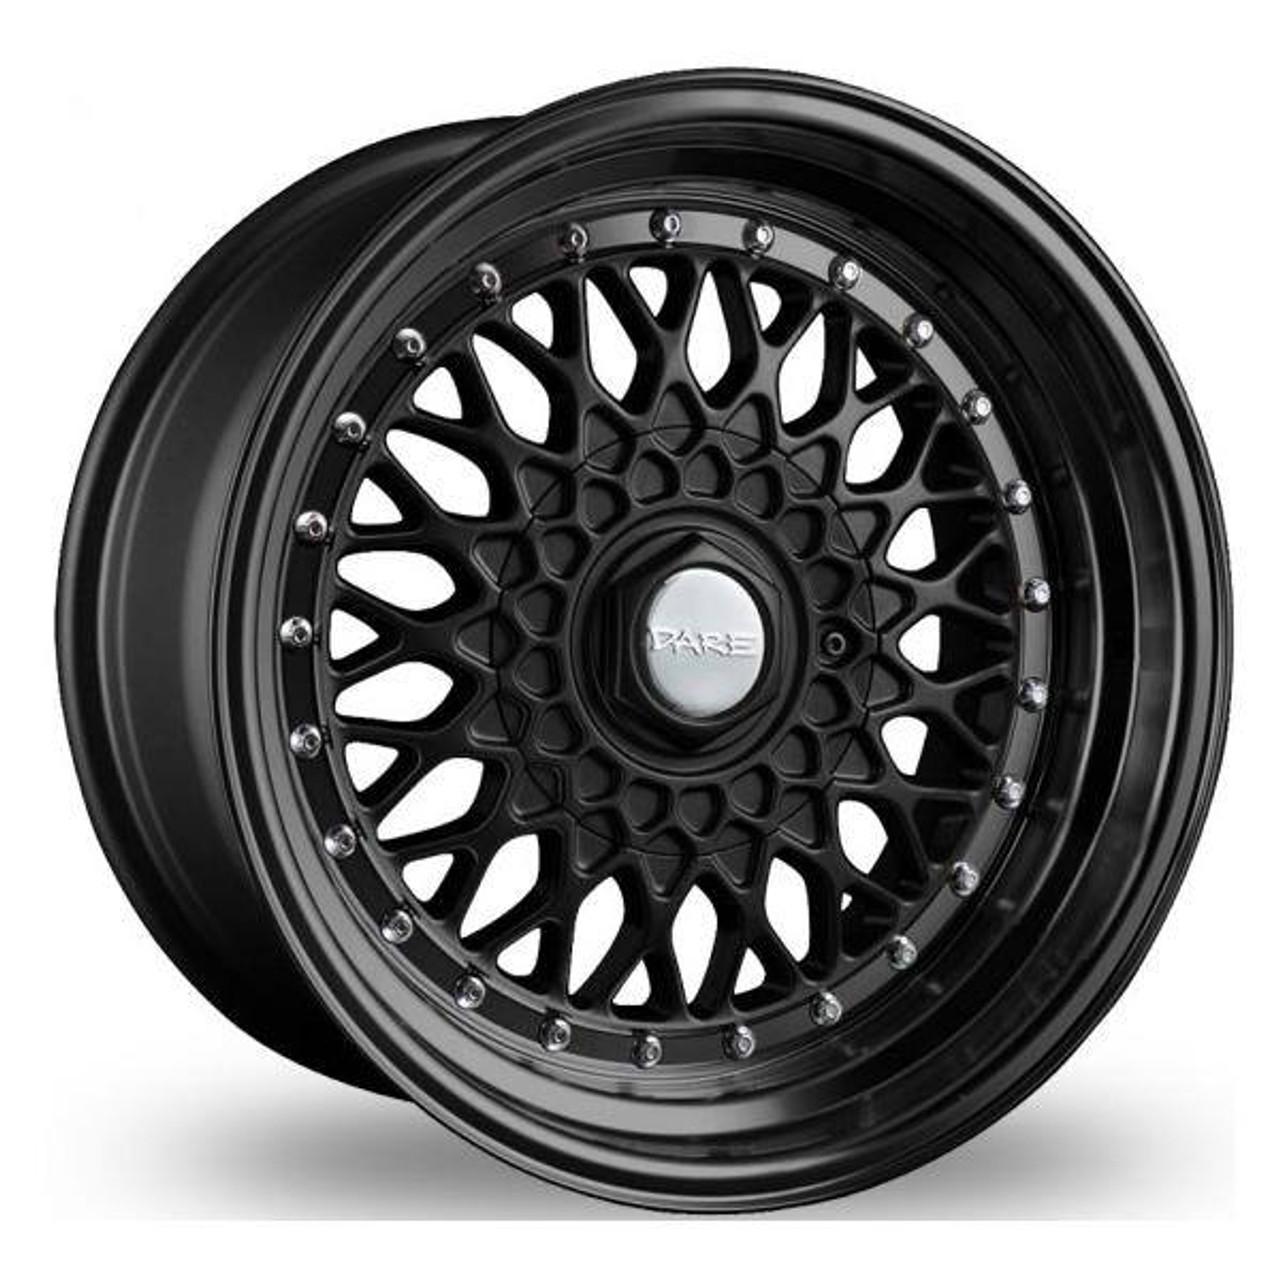 Dare DR RS Alloy Wheels Matt Black